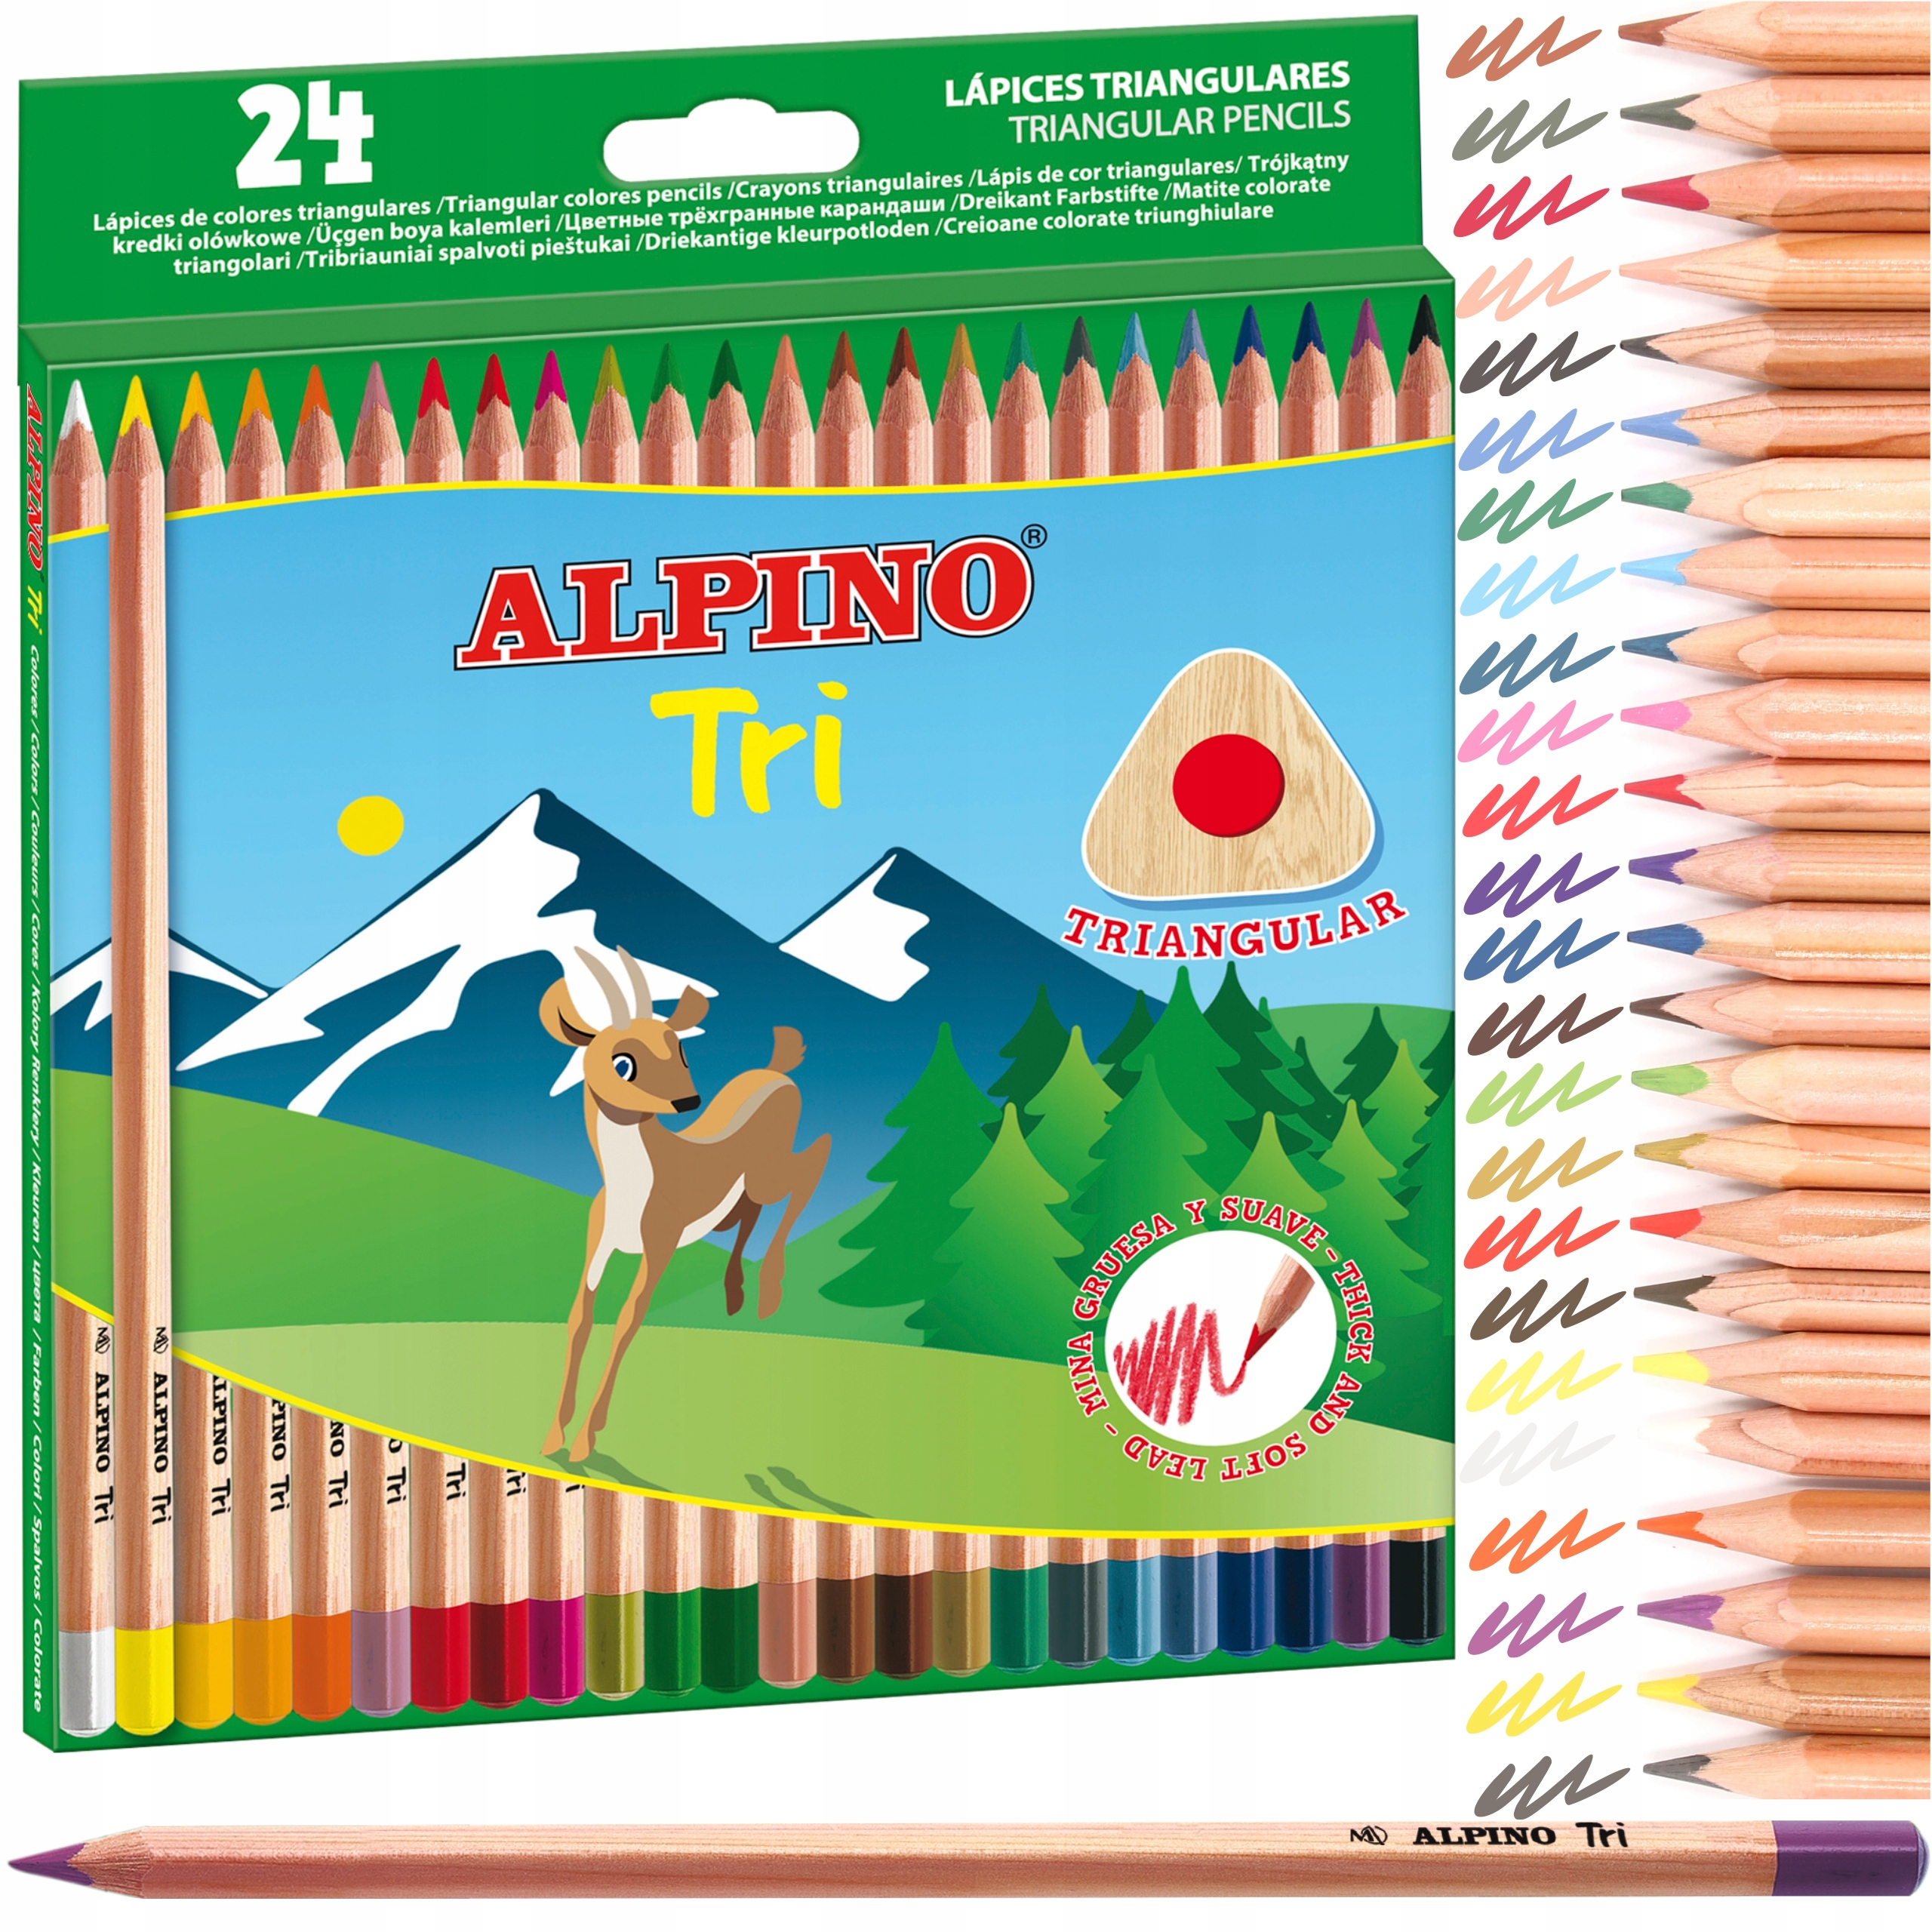 Kredki cedrowe Alpino TRI trójkątne 24 kolory